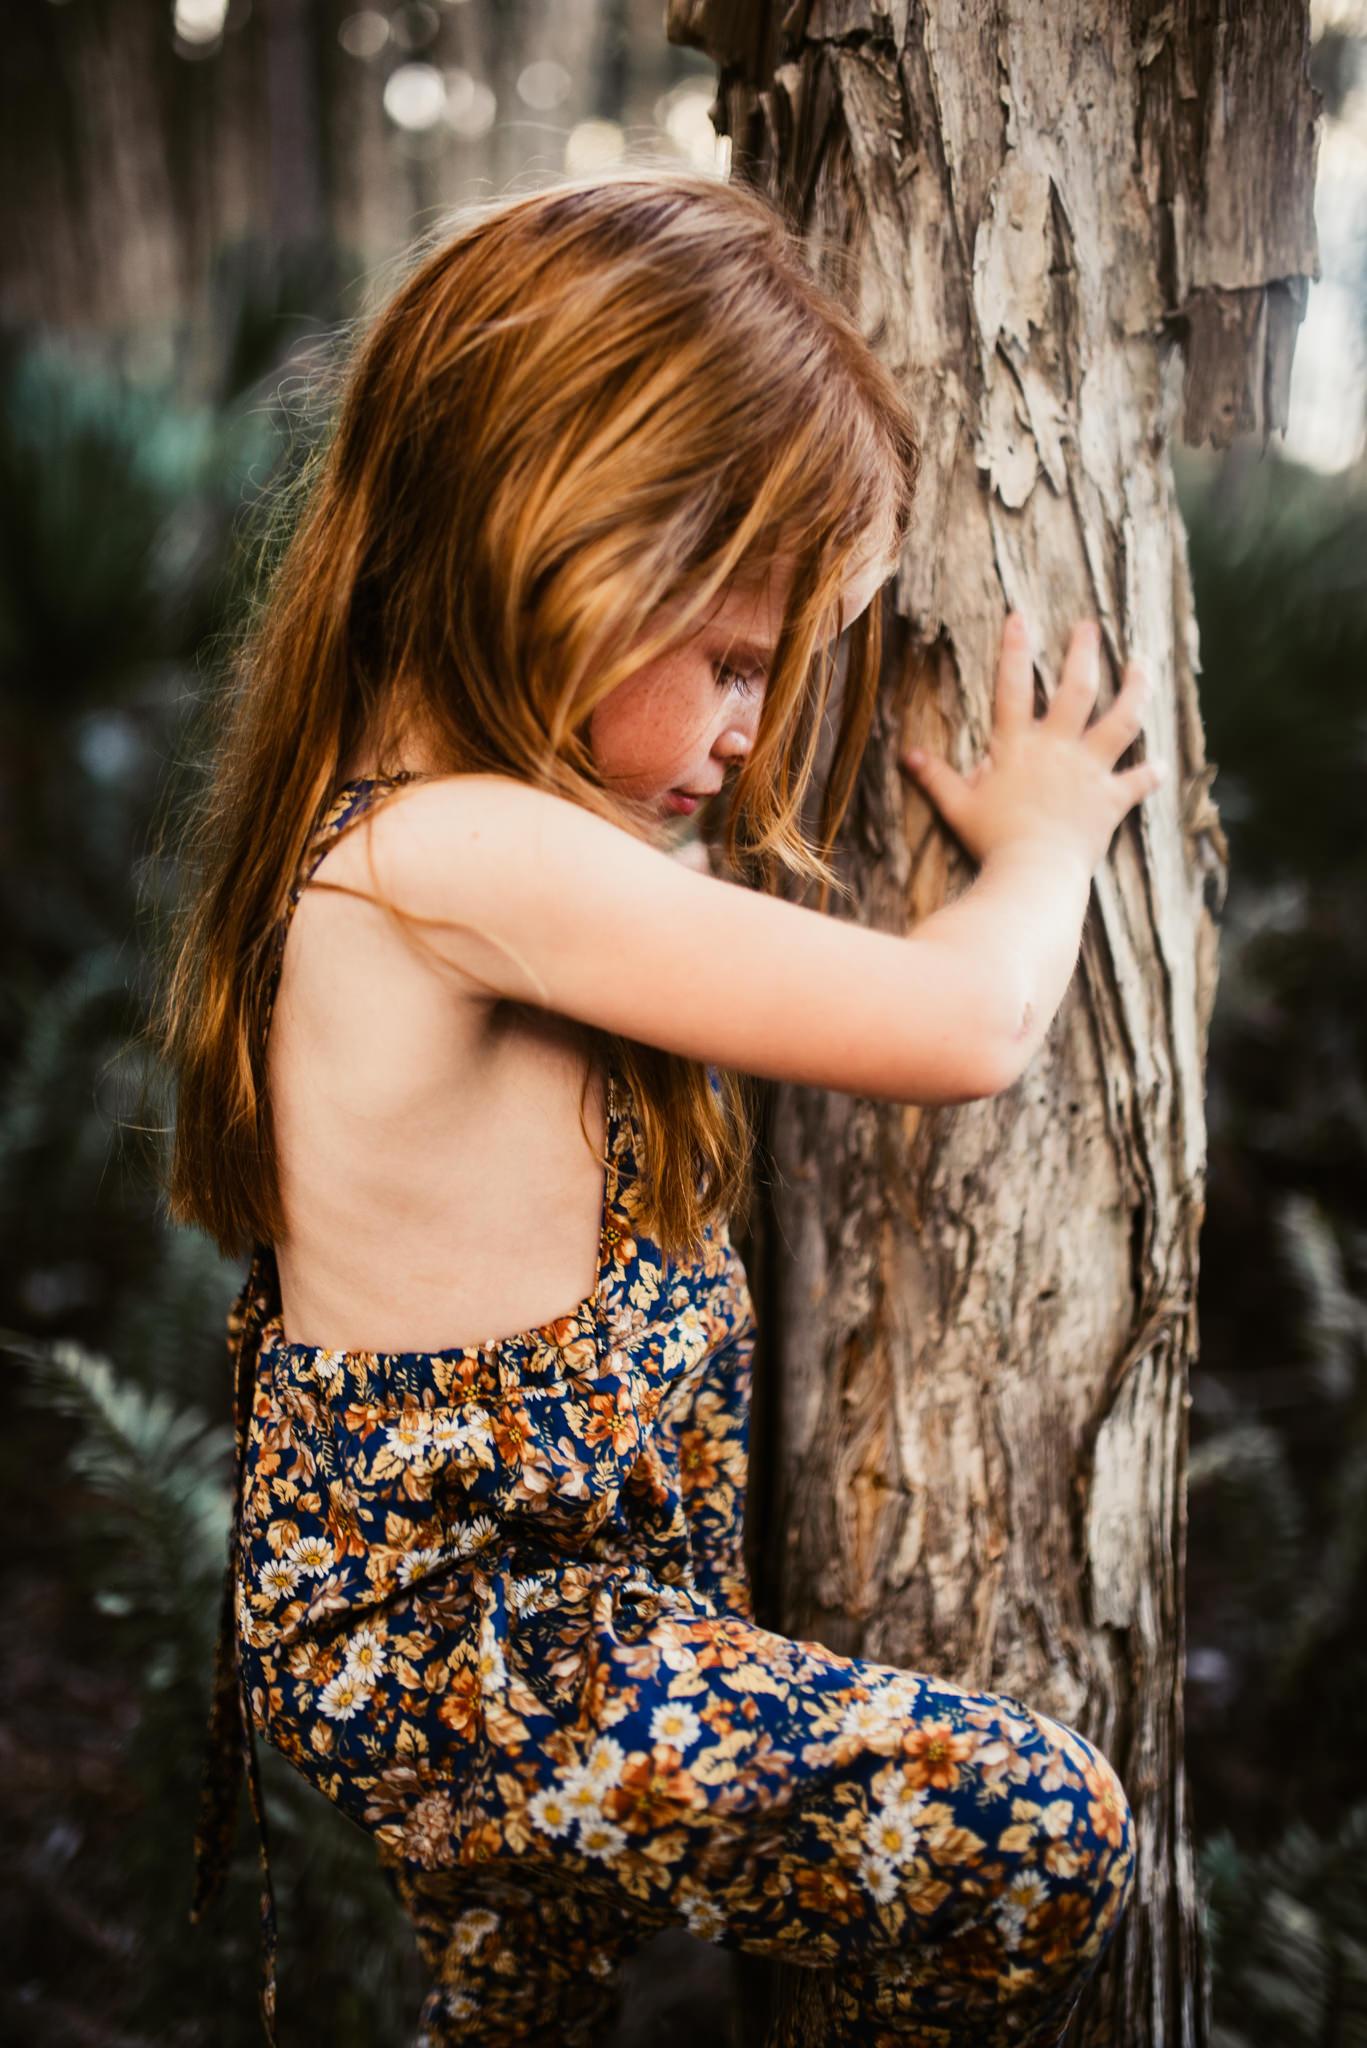 twyla jones photography - treasure coast florida - childrens adventure clothing commercial shoot--41.jpg